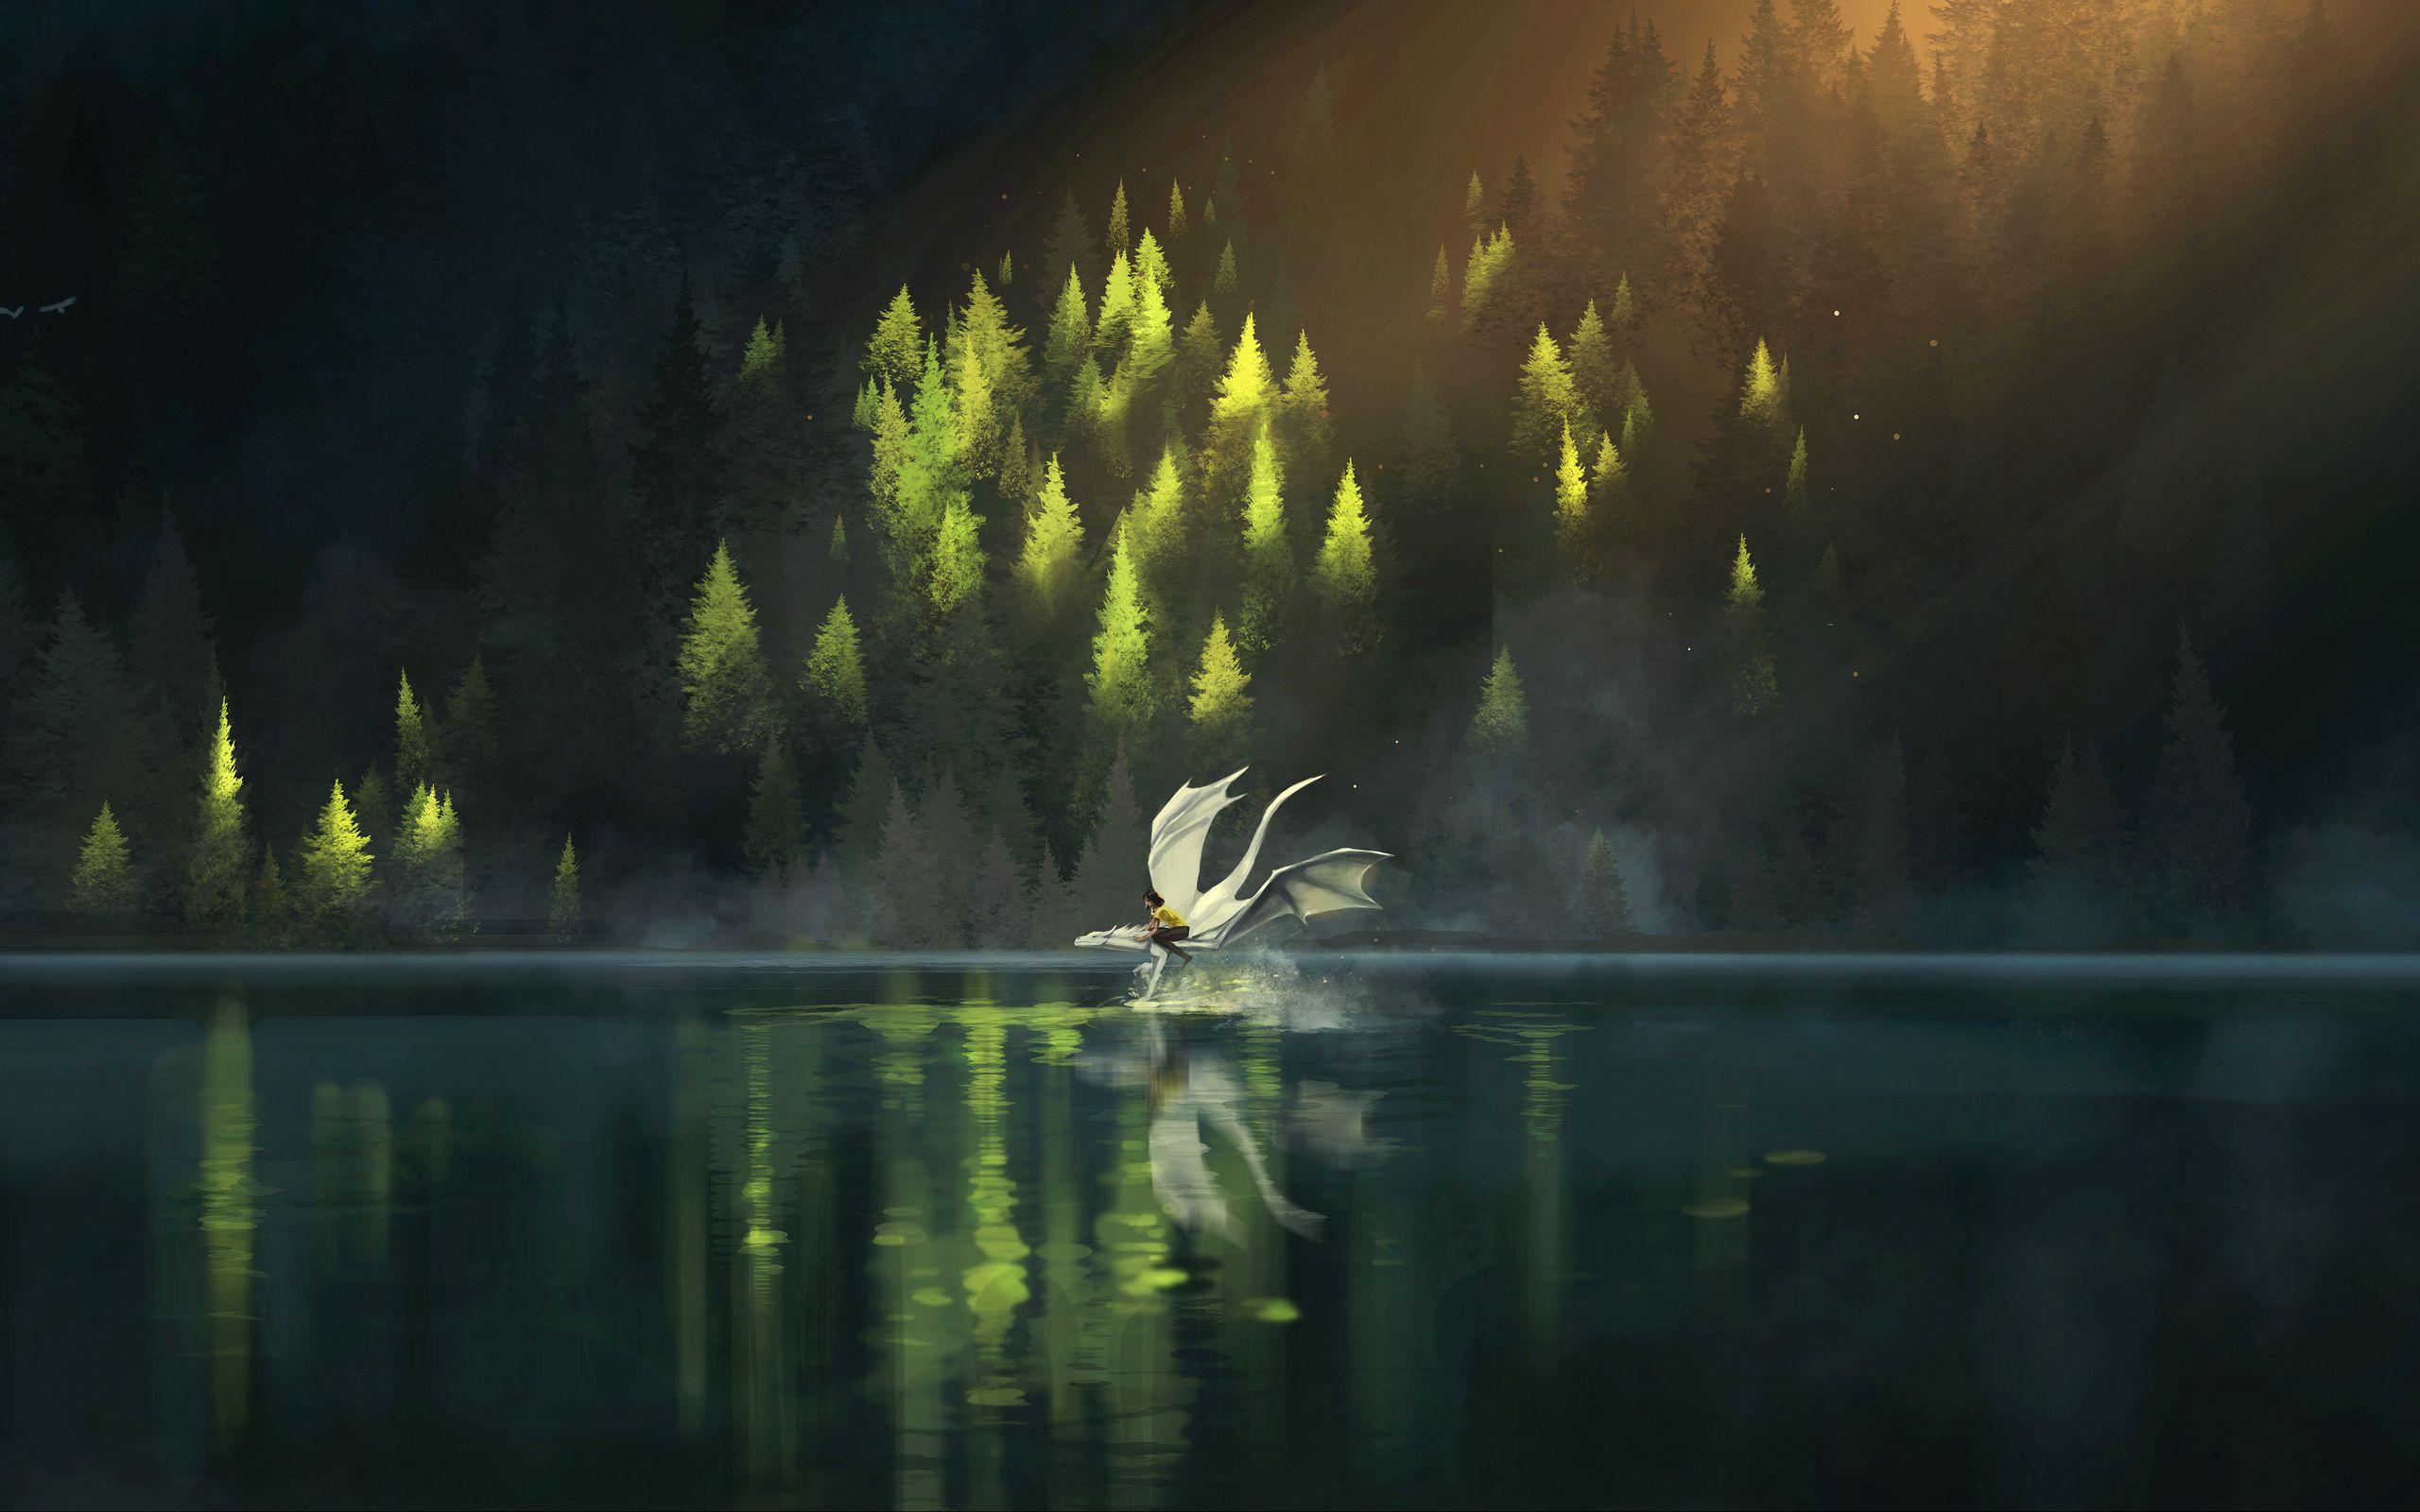 2560x1600 Wallpaper dragon, friends, fantasy, art